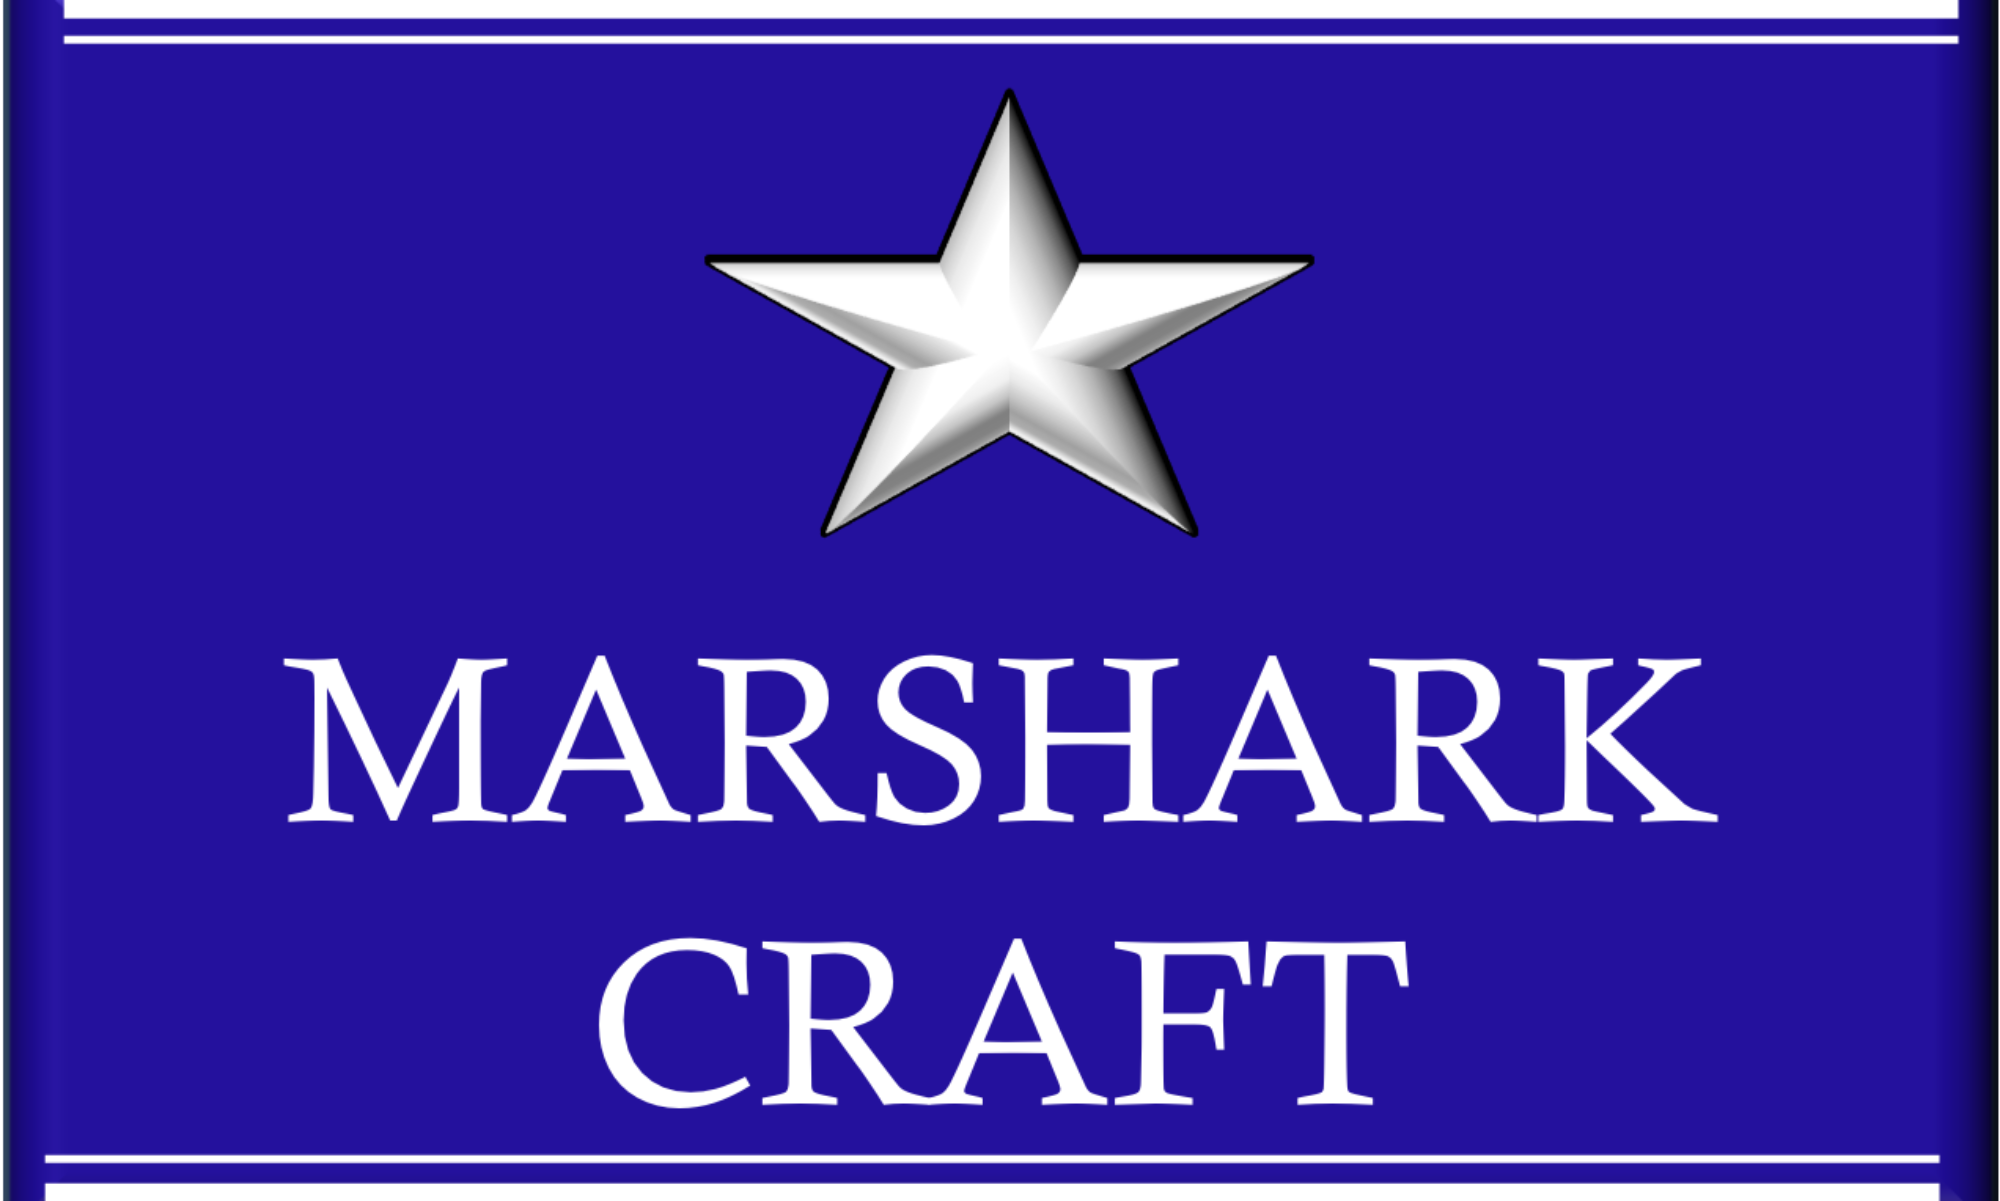 Marshark Craft